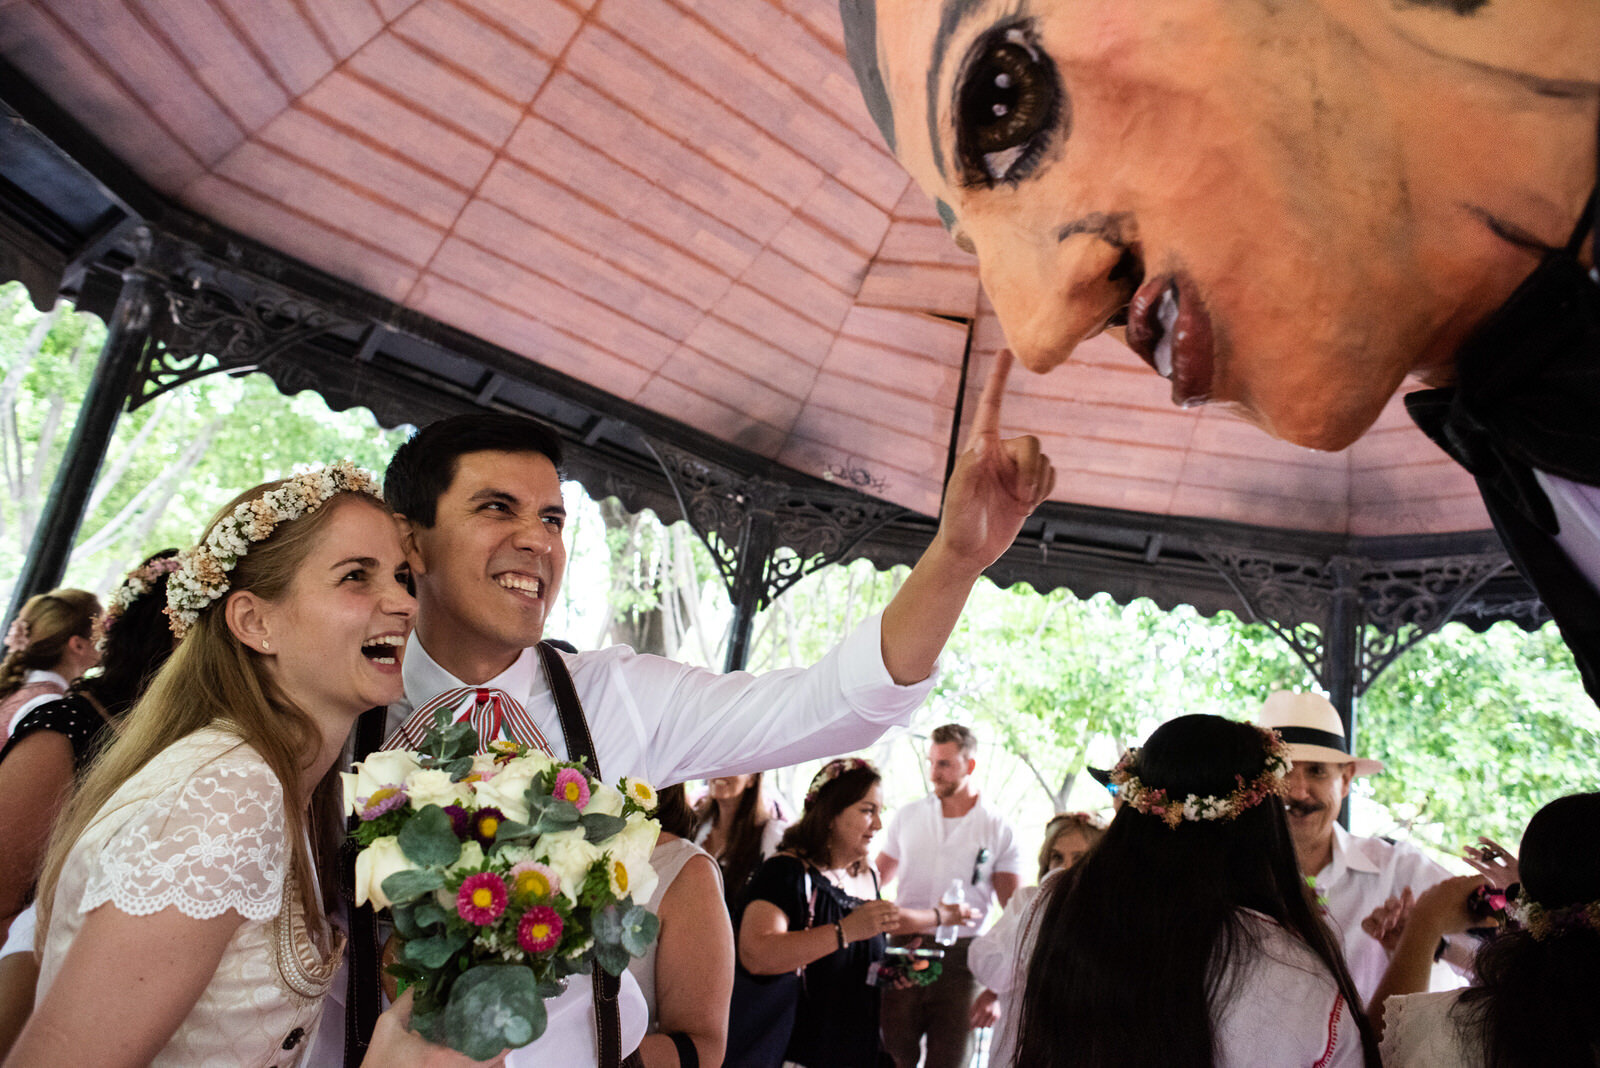 callejoneada_san_miguel_de_allende_wedding_photography_ (4).jpg